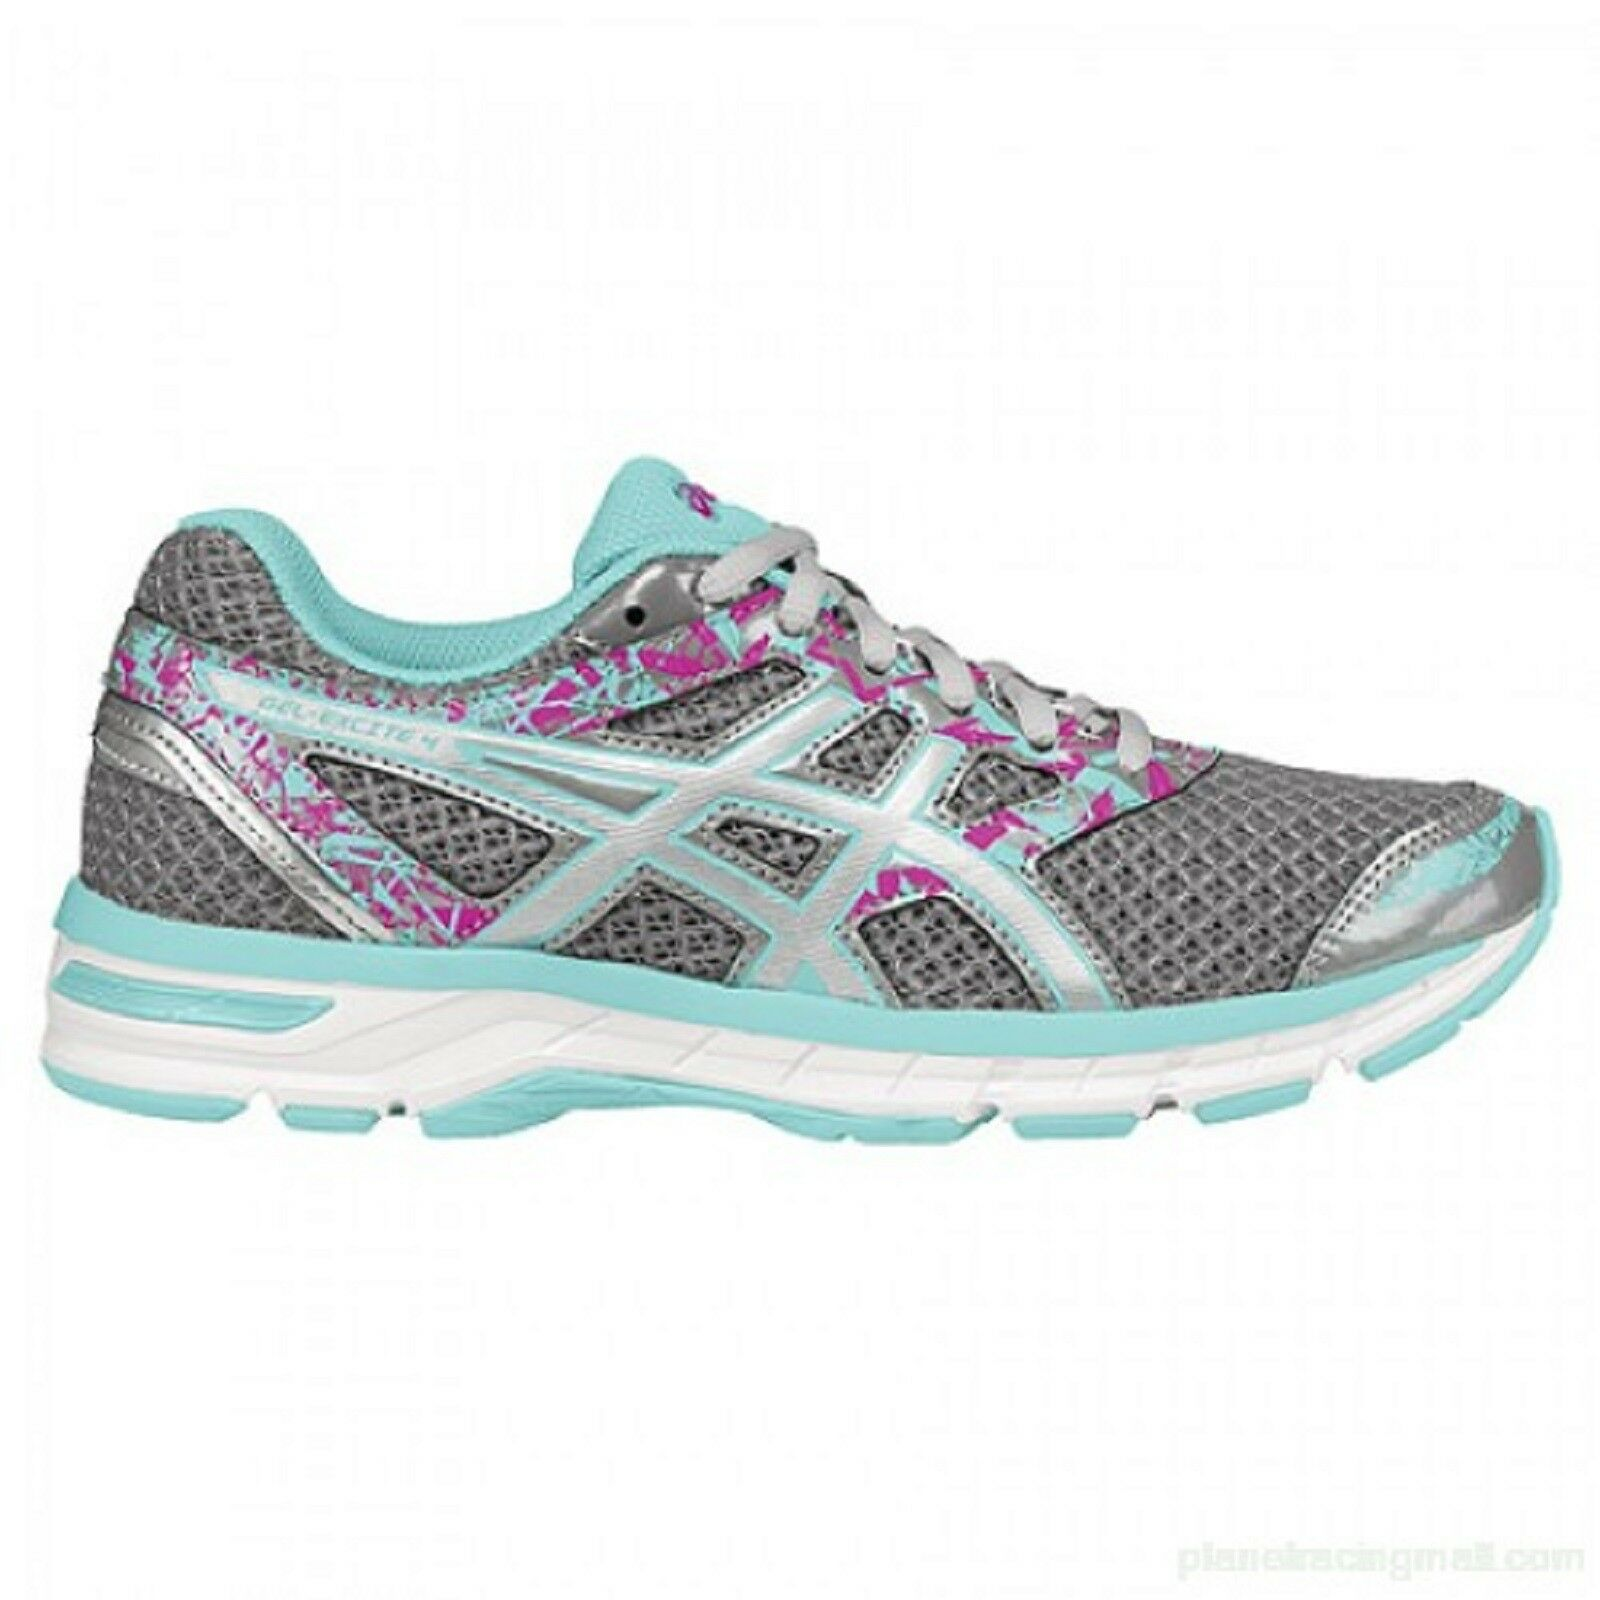 ASICS femmes  GEL-EXCITE 4  (T6E8N) Running Chaussures  GRY/WHT/AQUA/PK Sz. 7  NIB